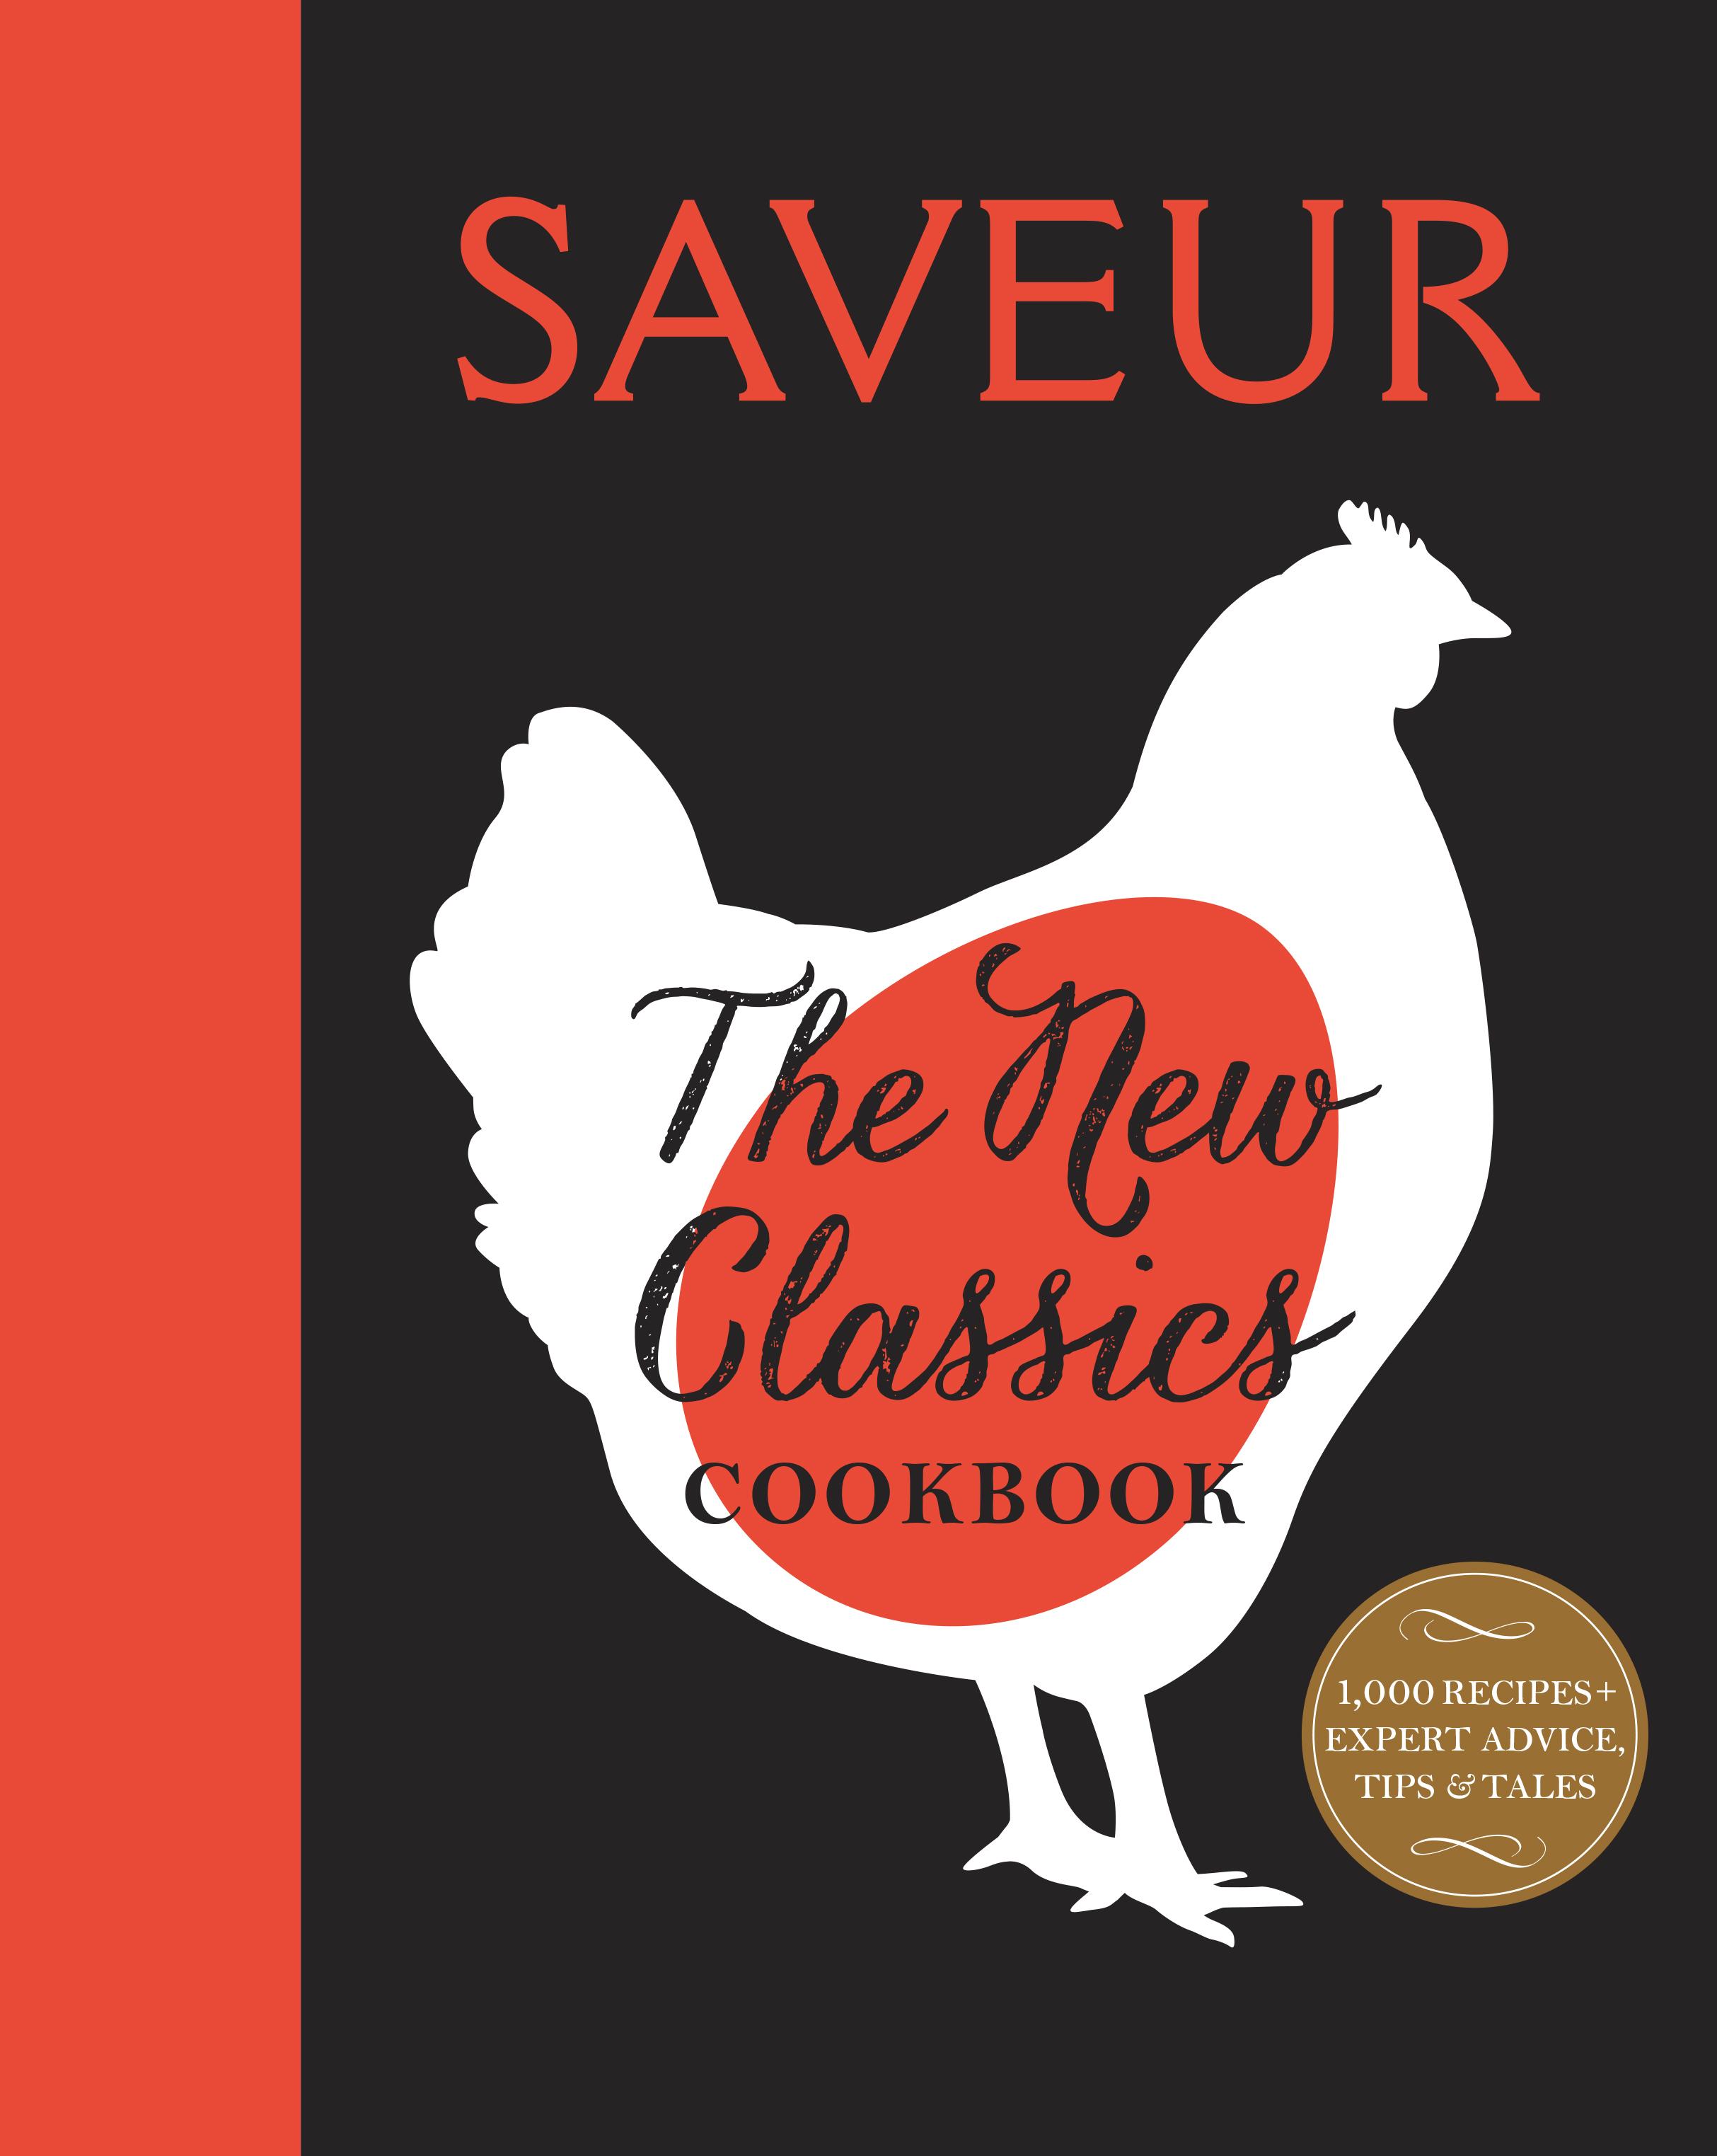 Cookbook Launch: Saveur: The New Classics Cookbook with Adam Sachs, Carla Hall, Alex Guarnaschelli, & Melissa Clark